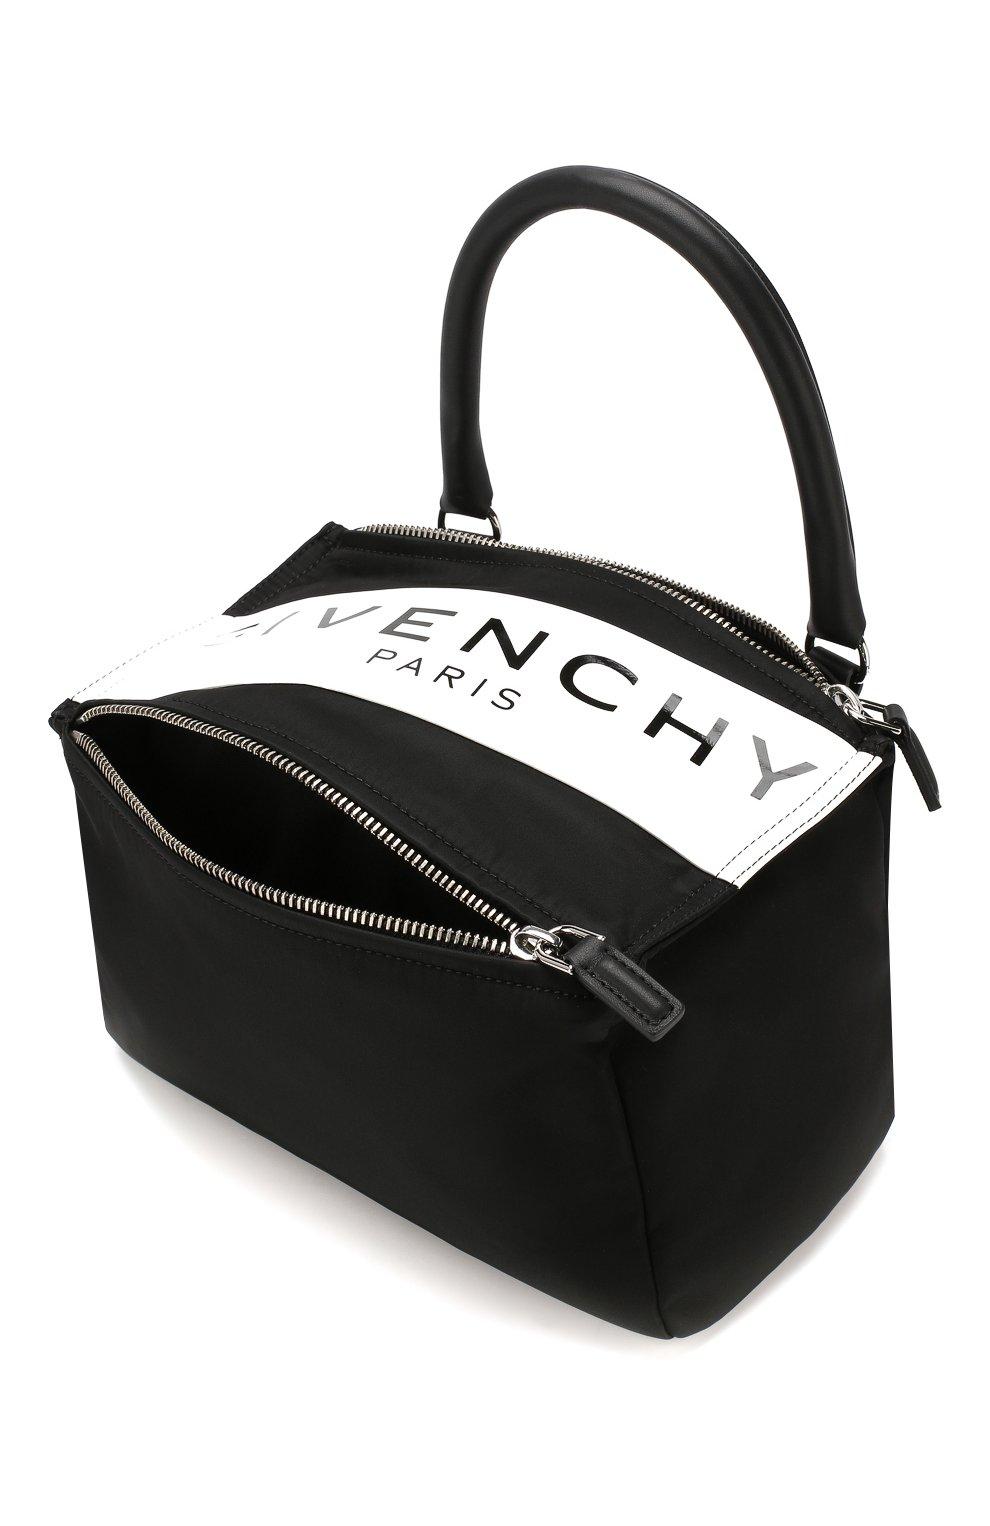 Сумка Pandora small Givenchy черная цвета | Фото №4